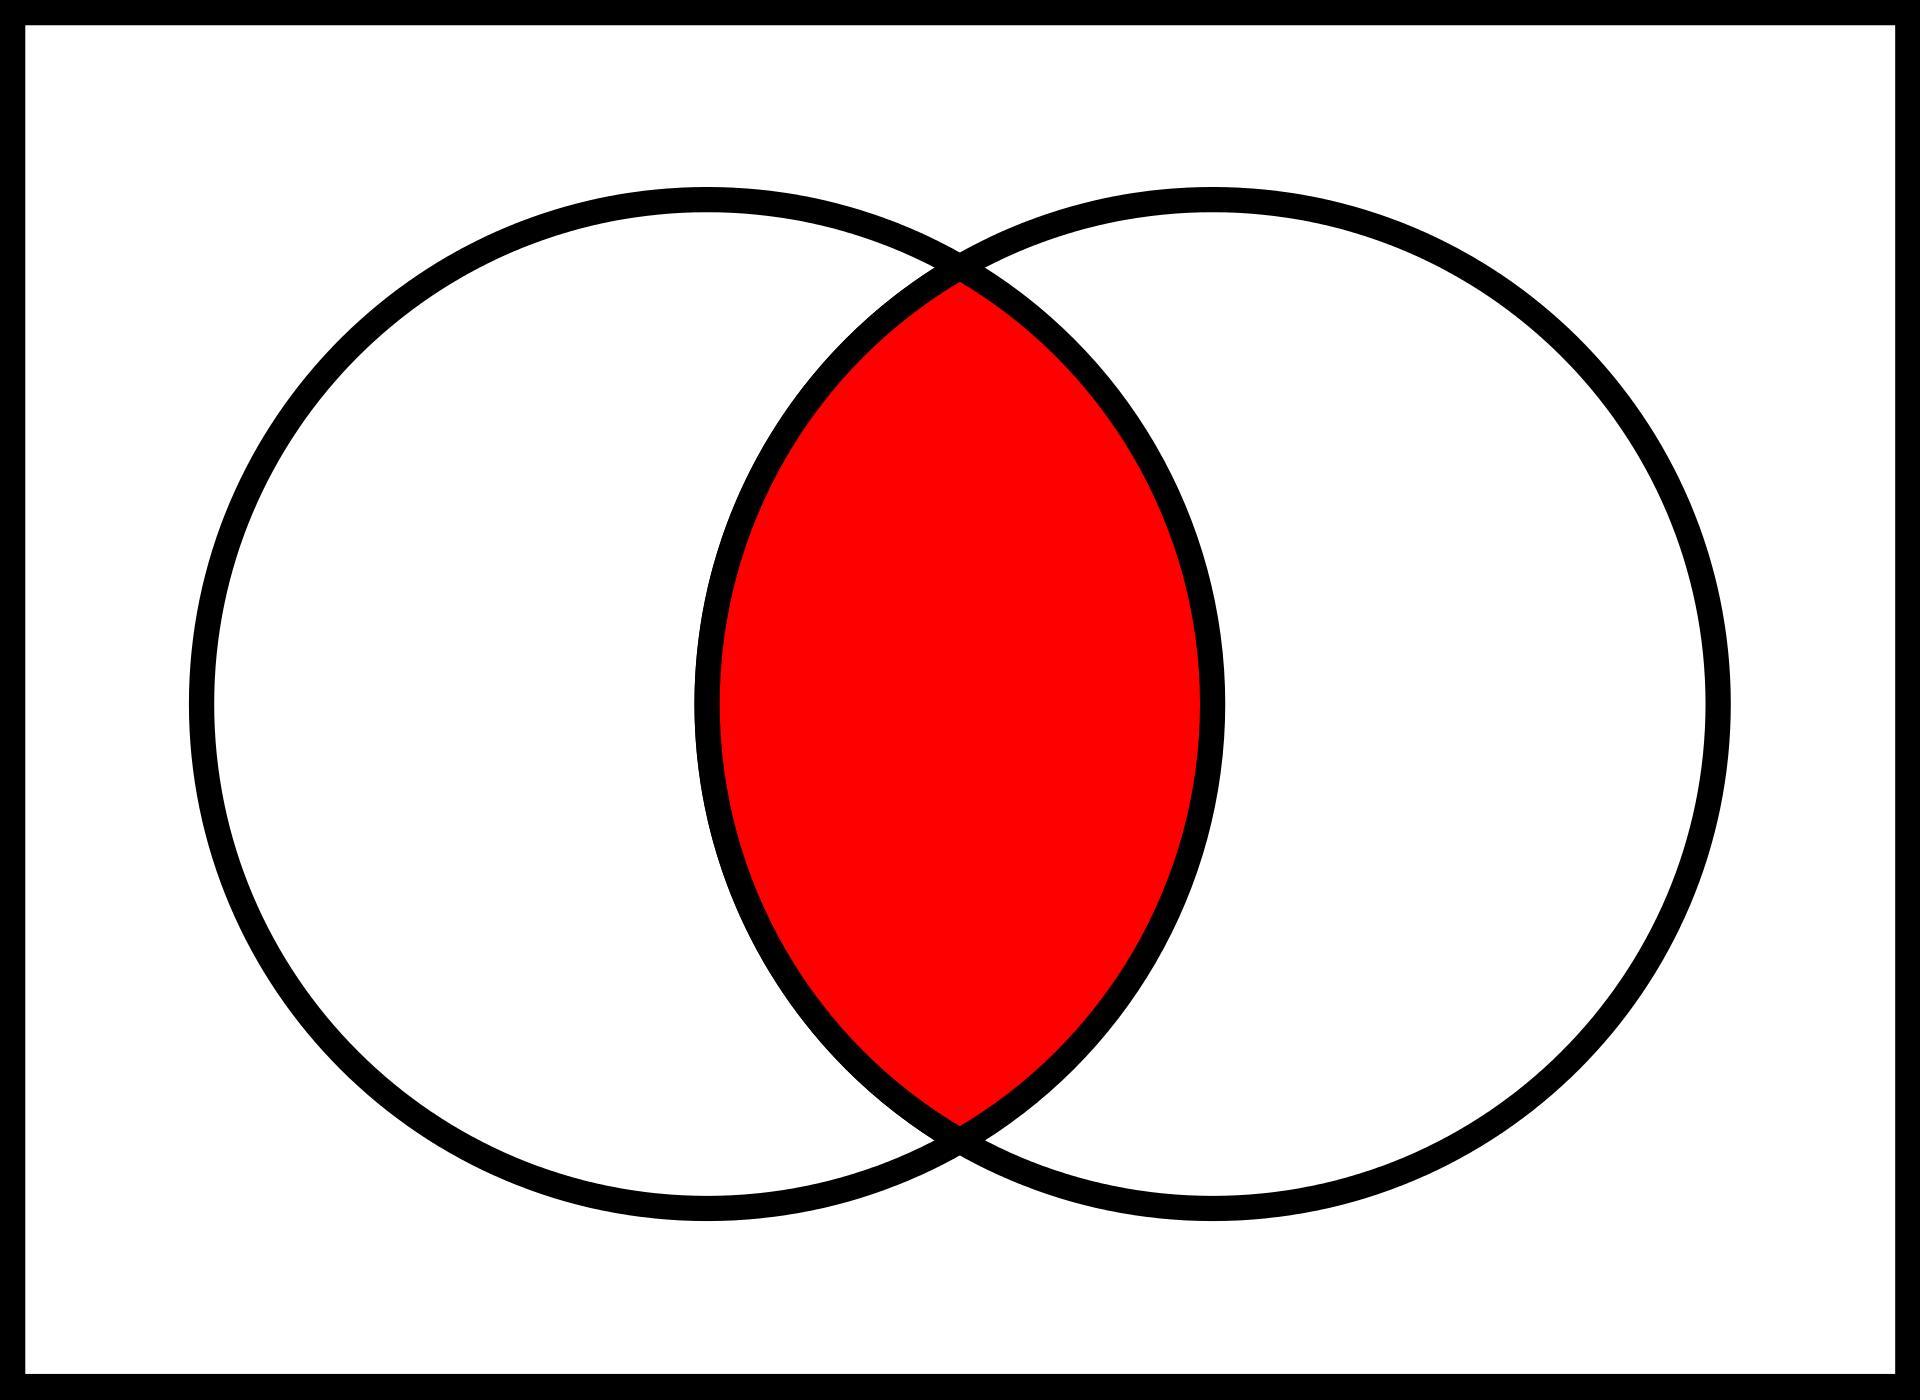 Wiskunde-werkbladen Venn-diagram Redactiesommen 4